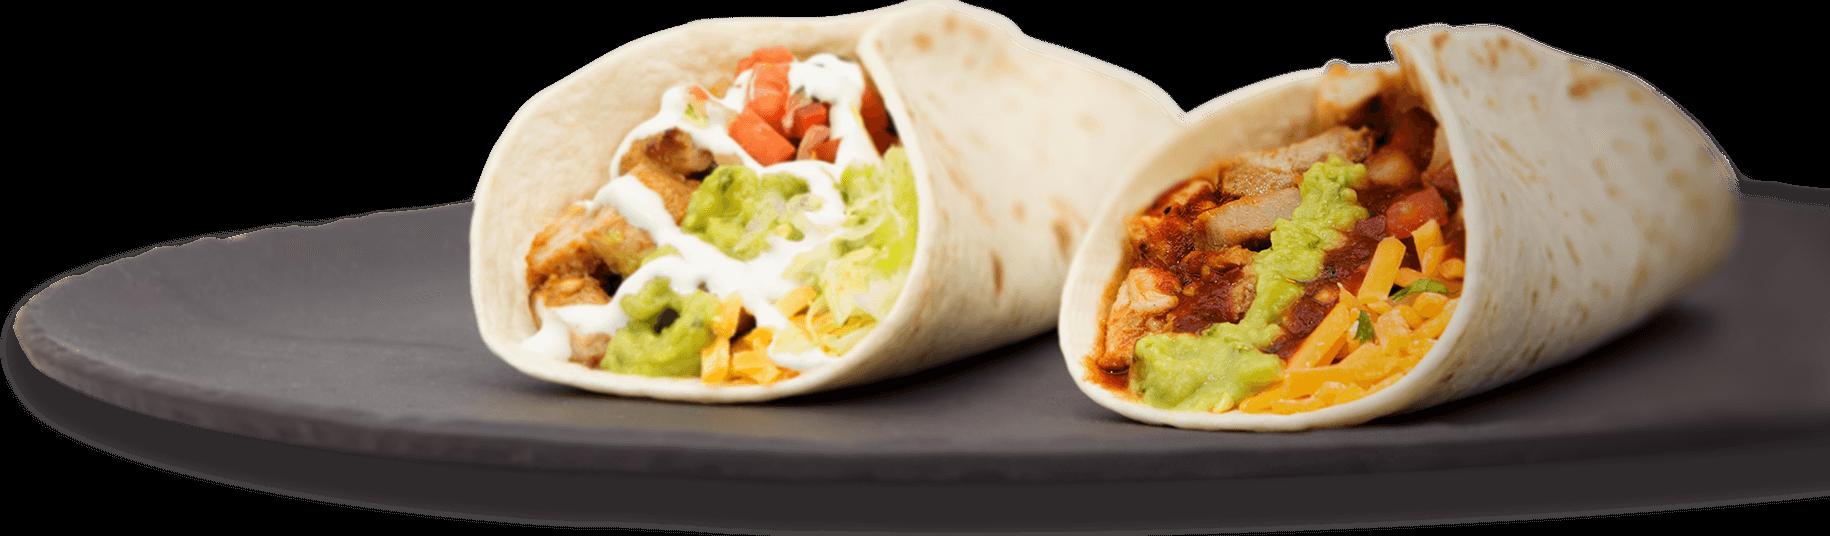 nachos-tacos